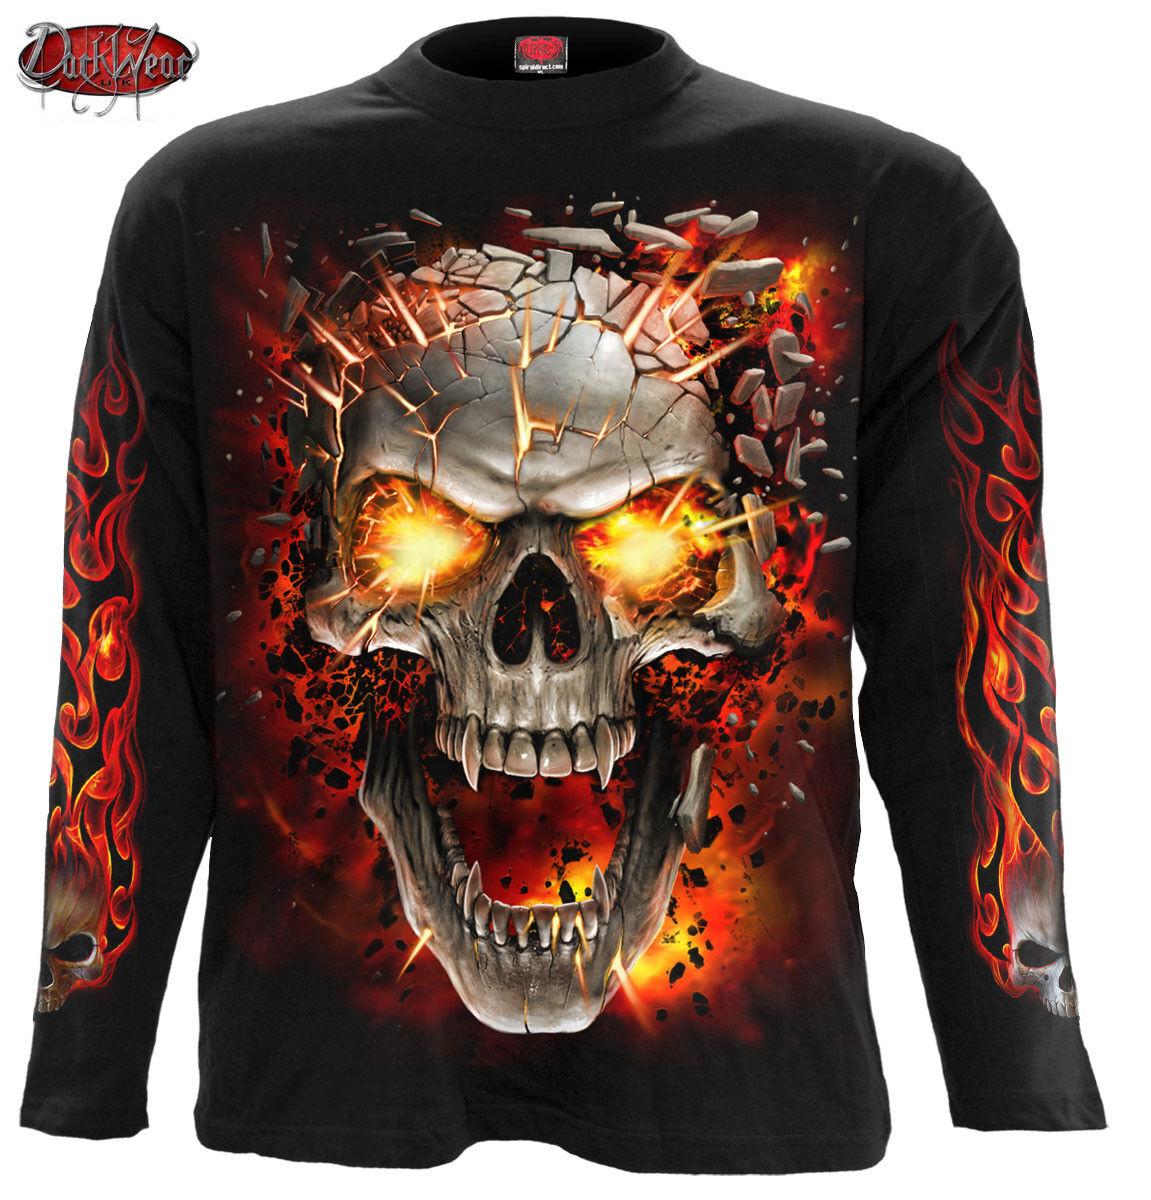 SPIRAL DIRECT SKULL BLAST Long Sleeve T-Shirt Tattoo Fire Skull Goth Flames Top